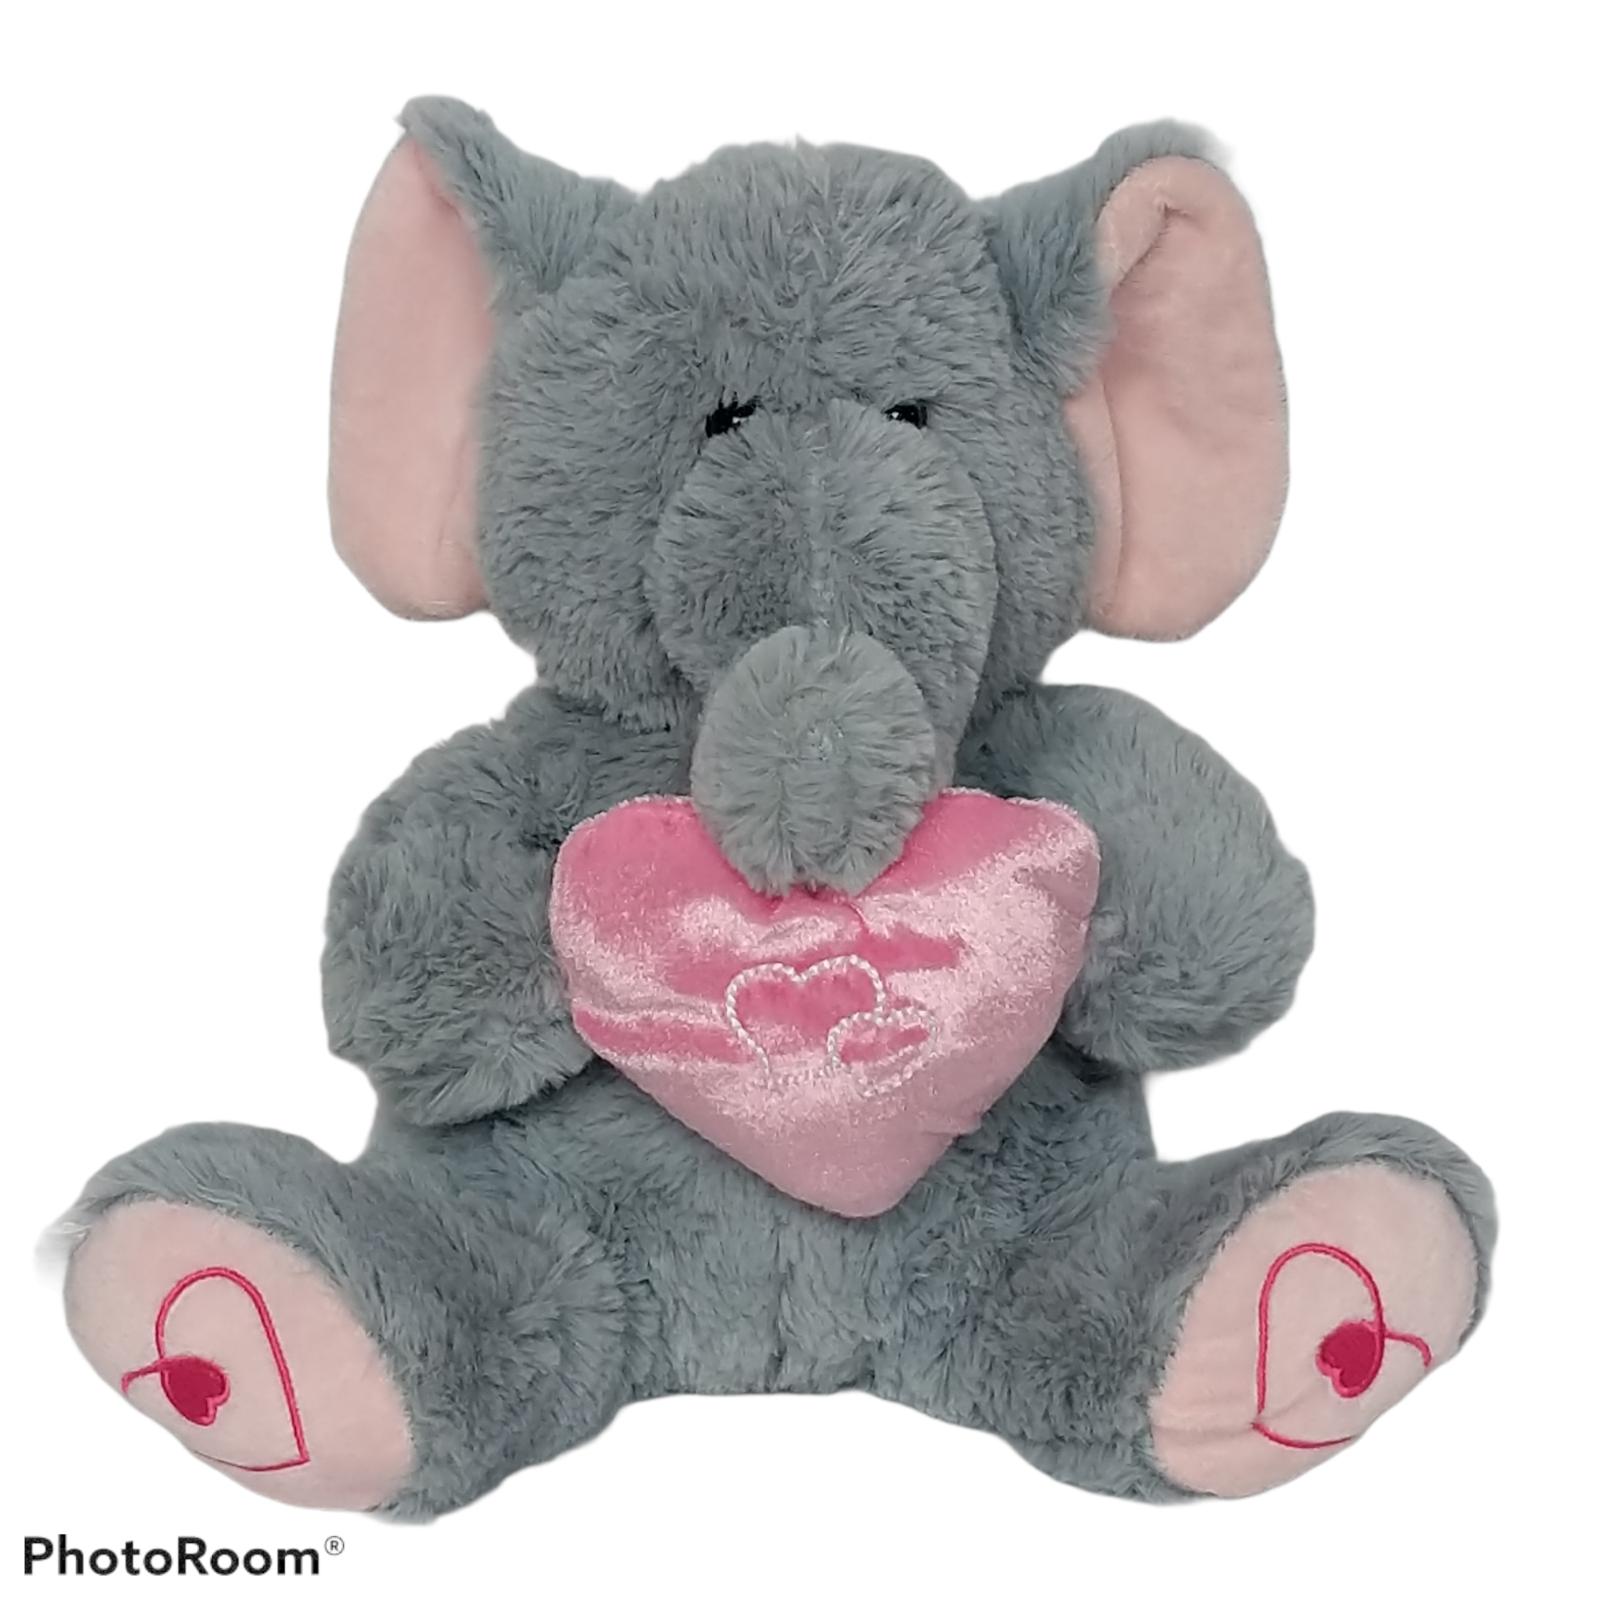 "Best Made Toys Valentines Elephant Holding Heart Plush 2014 13.25"" - $24.75"